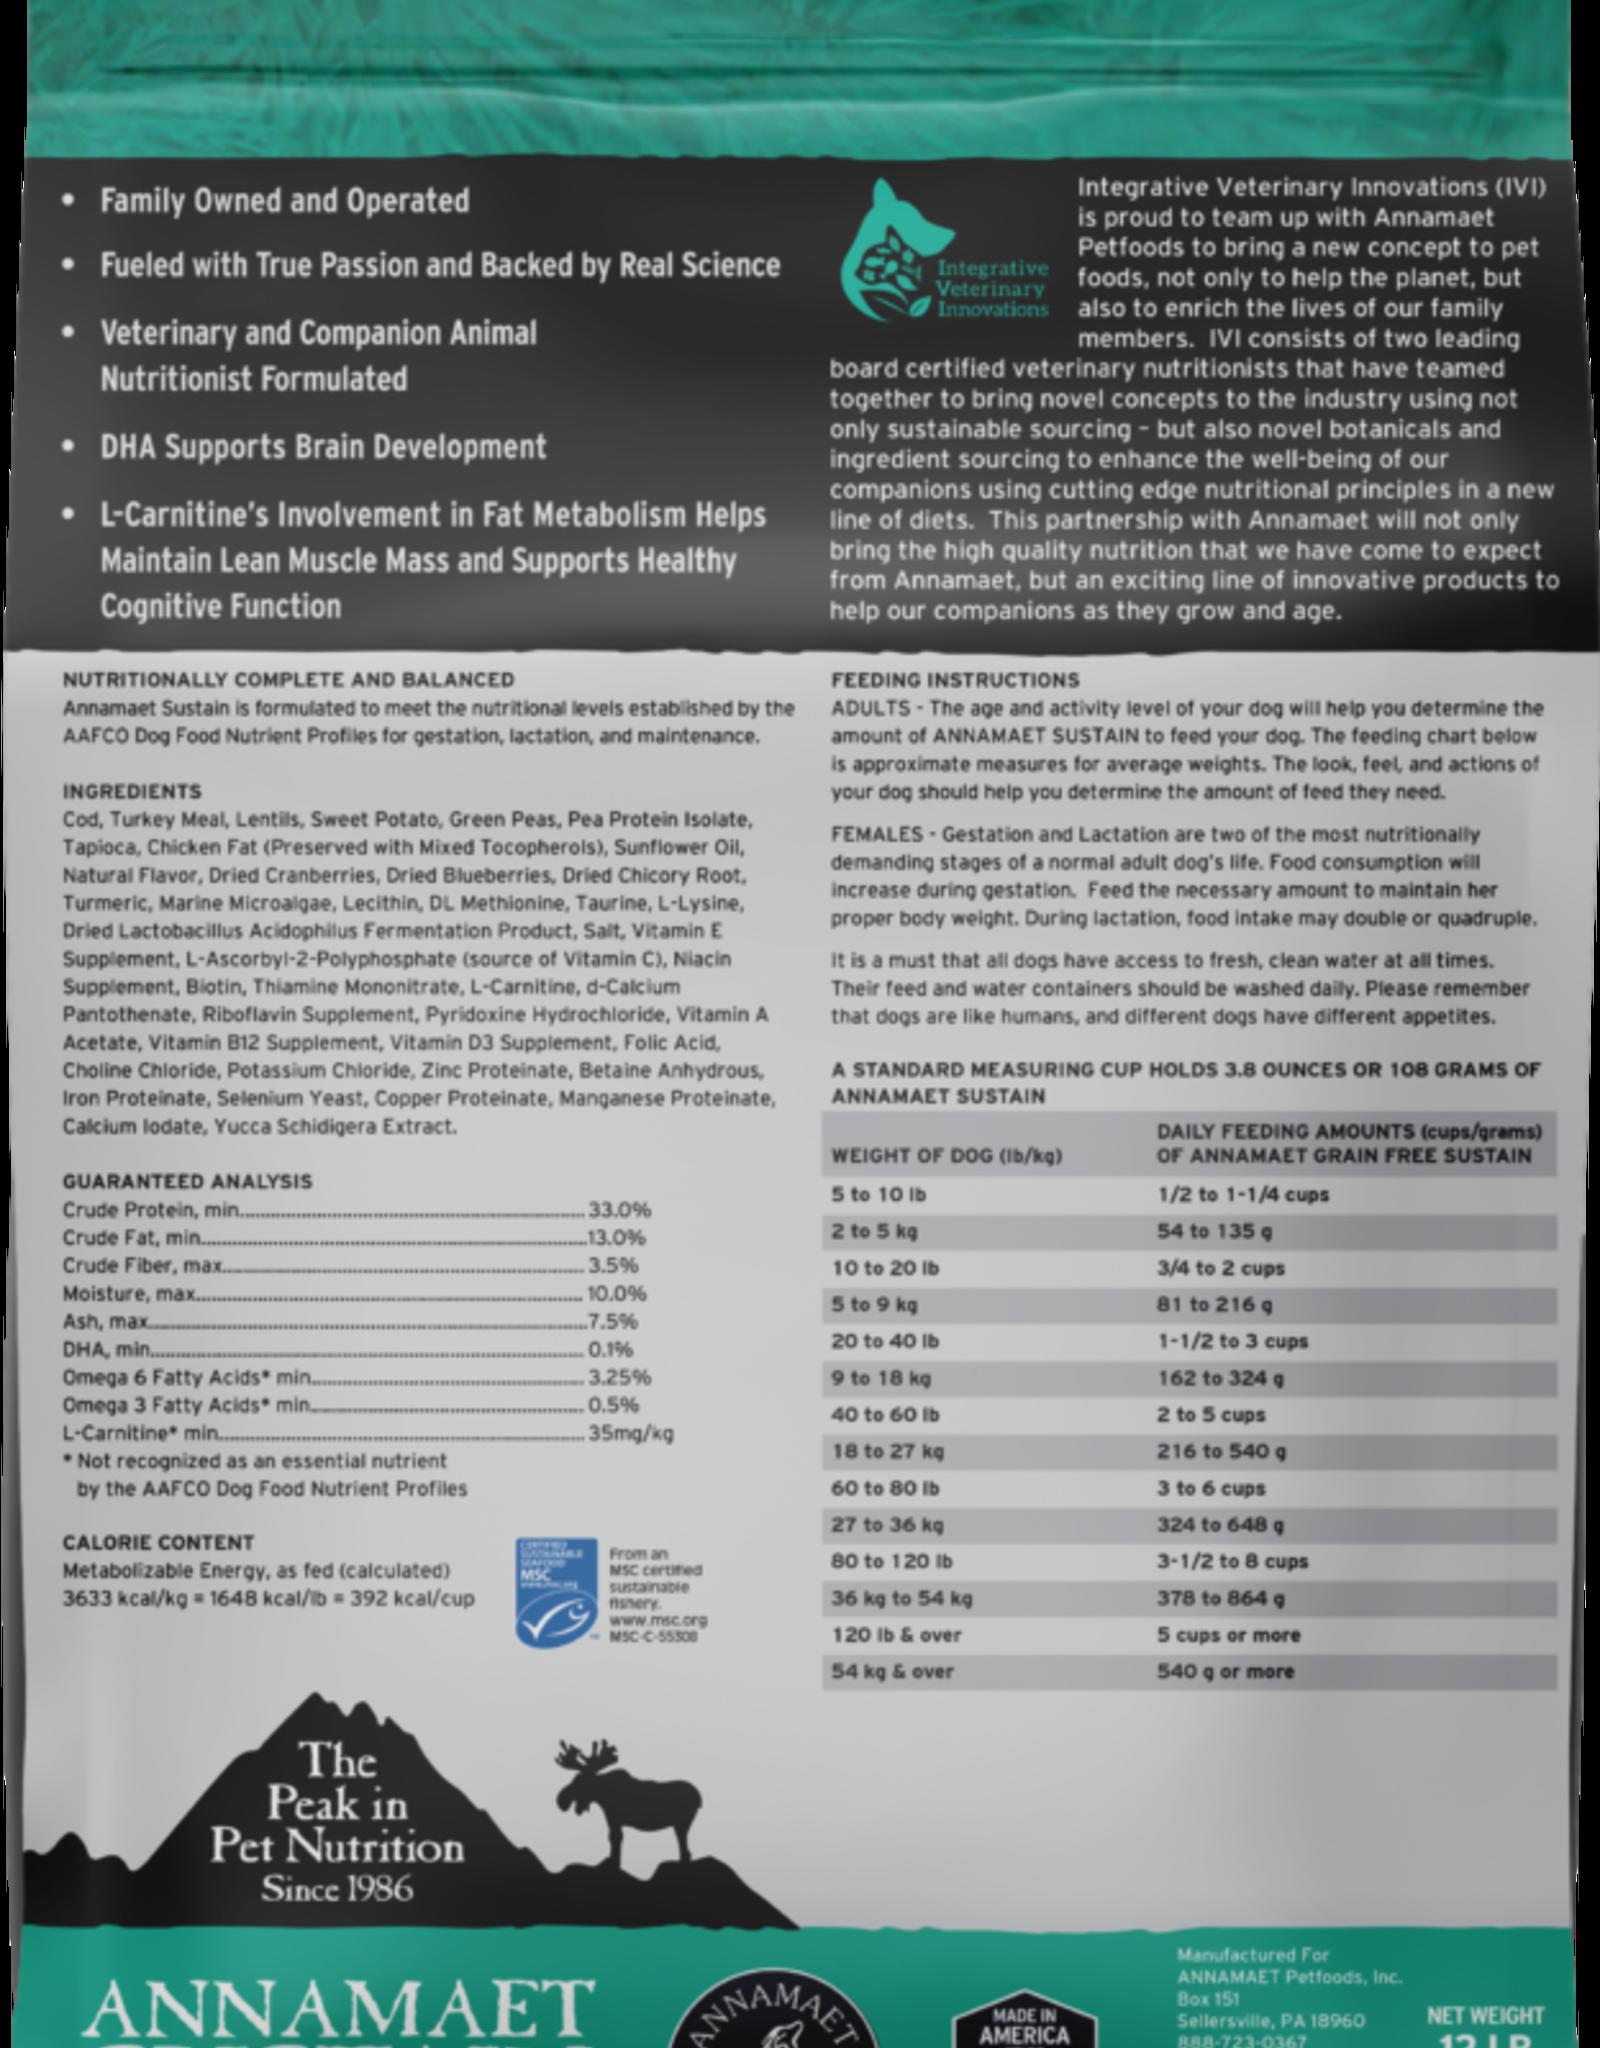 Annamaet ANNAMAET DOG GRAIN FREE SUSTAIN FISH 15LBS